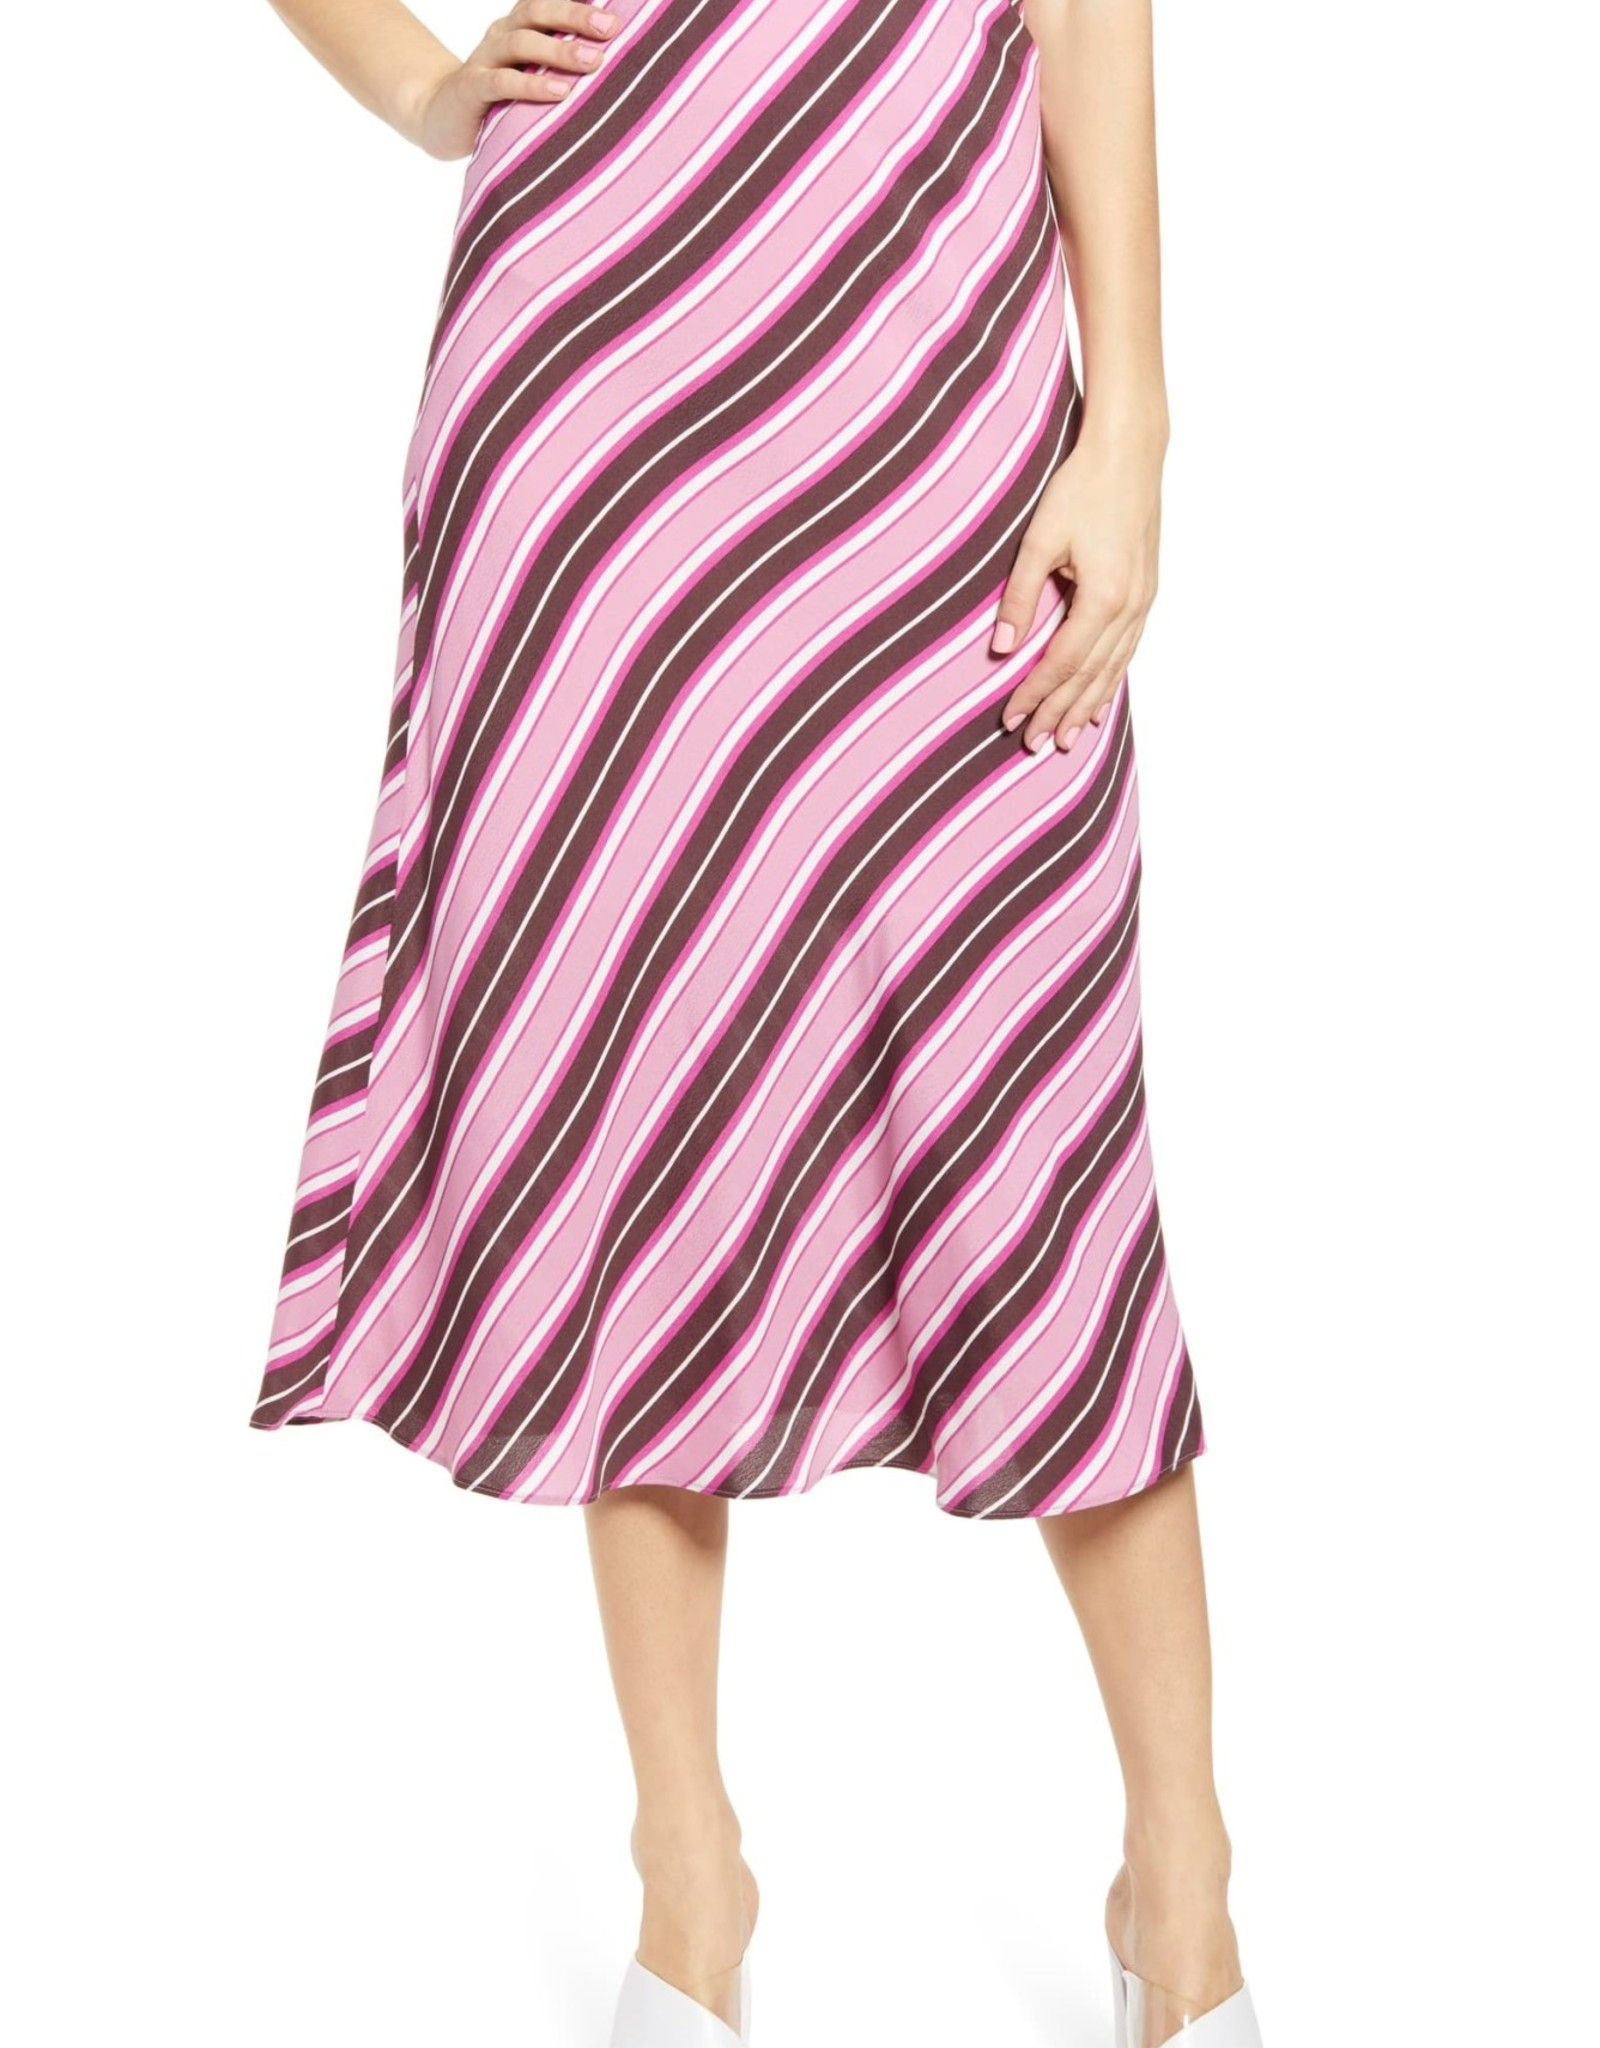 Leith Leith Bias Cut Midi Skirt